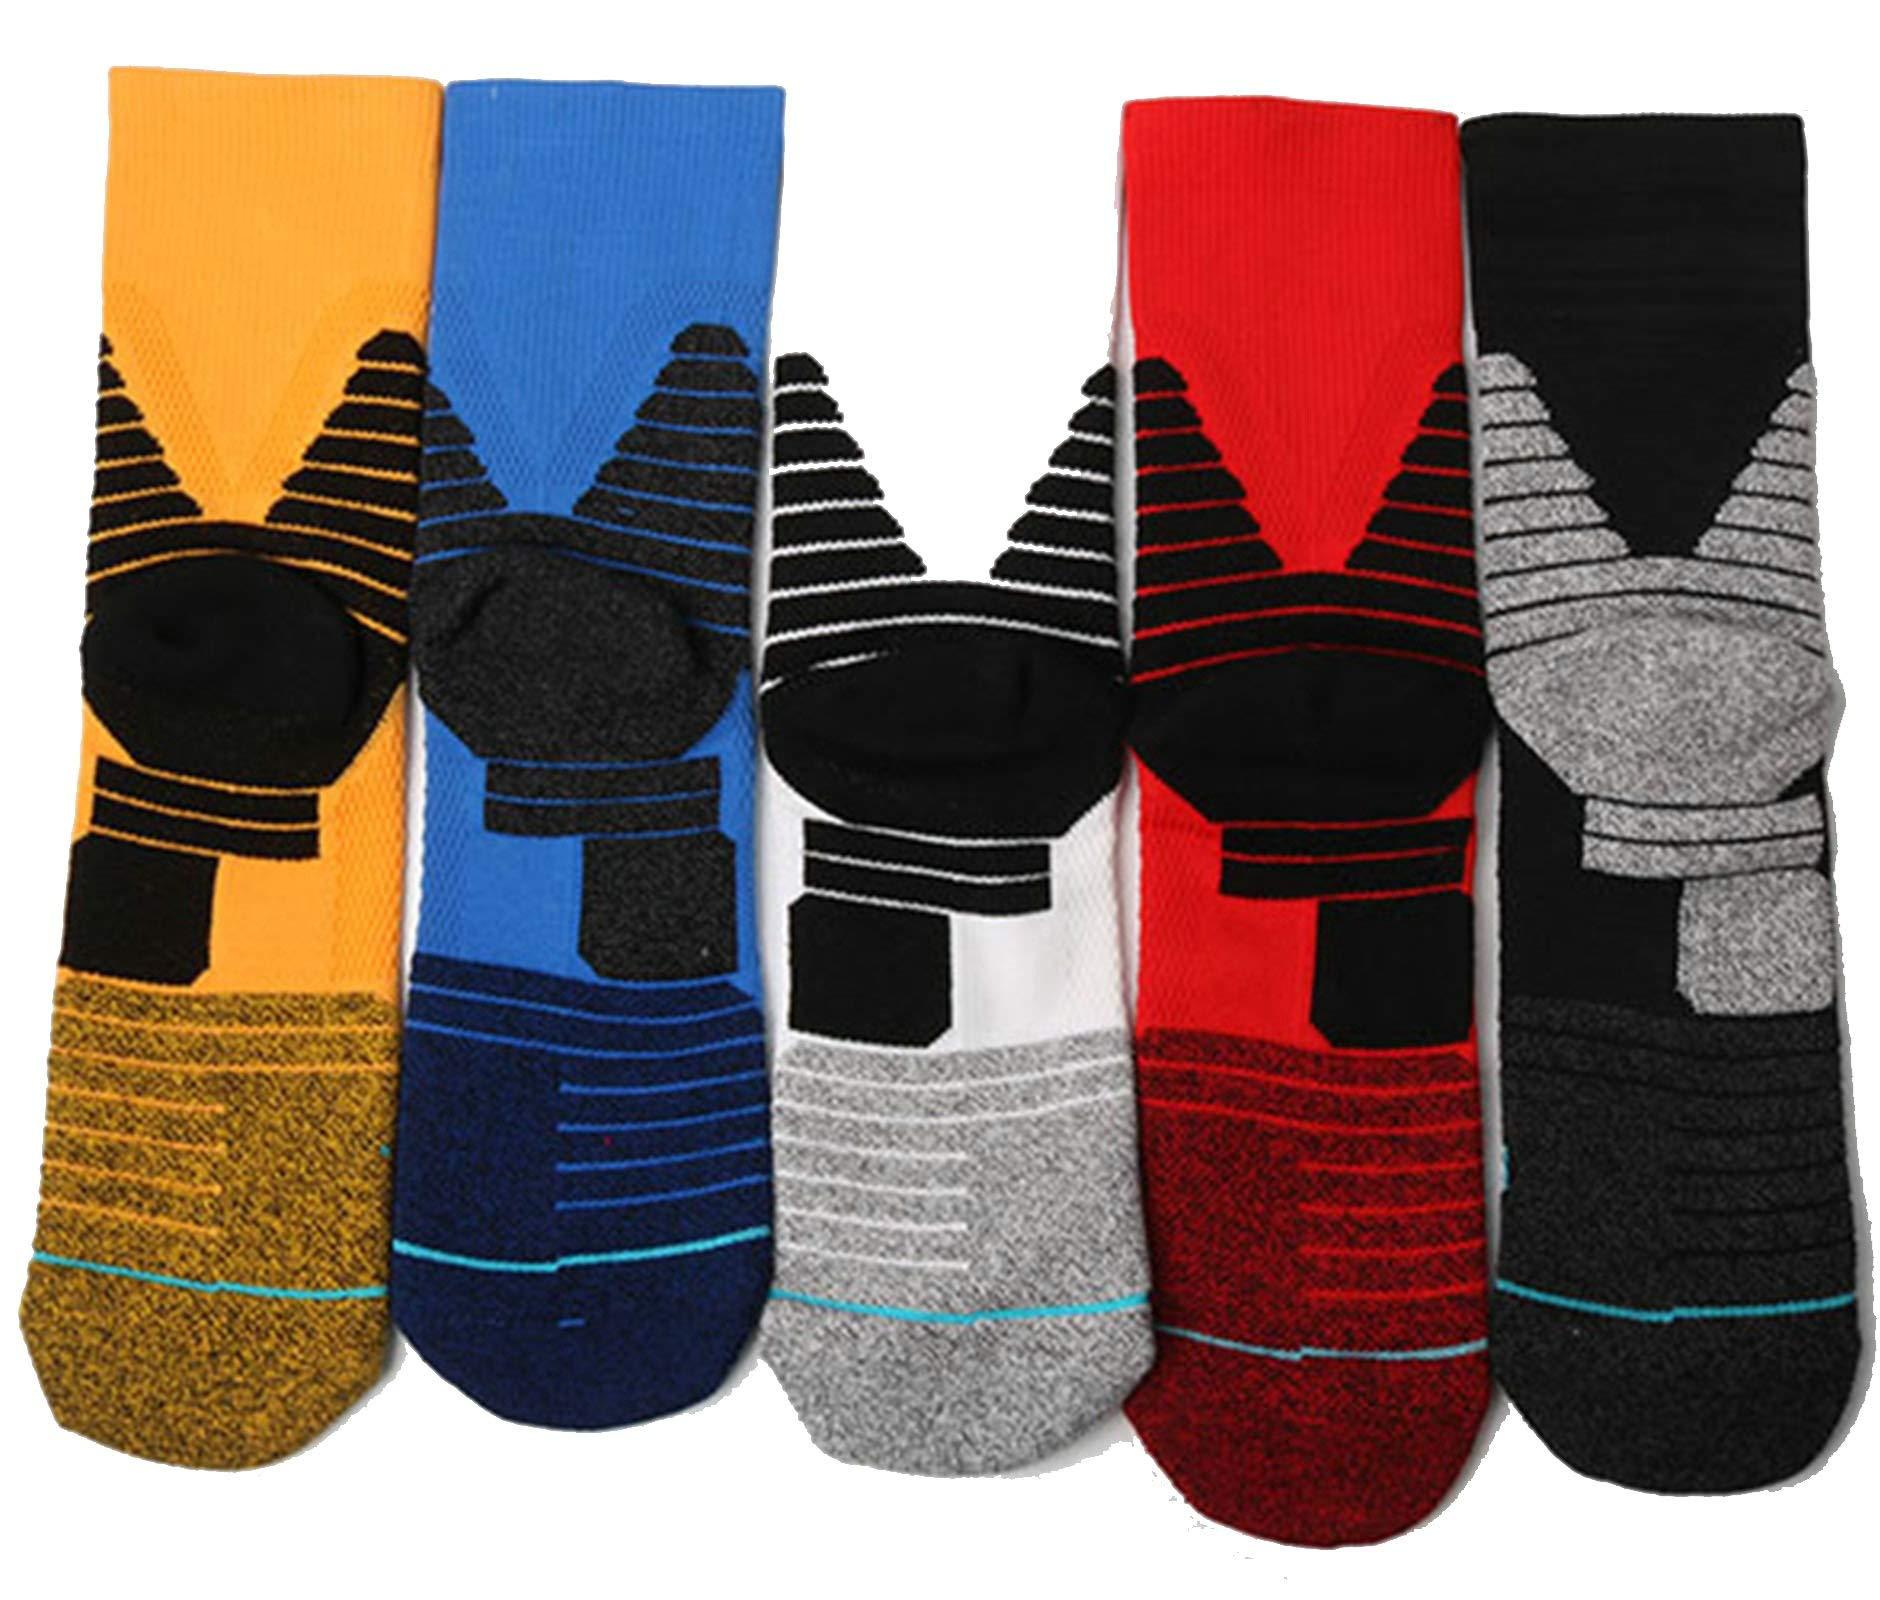 Thick Towel Bottom Basketball Socks Medium-Length Sports Socks Size L Code 5Pair